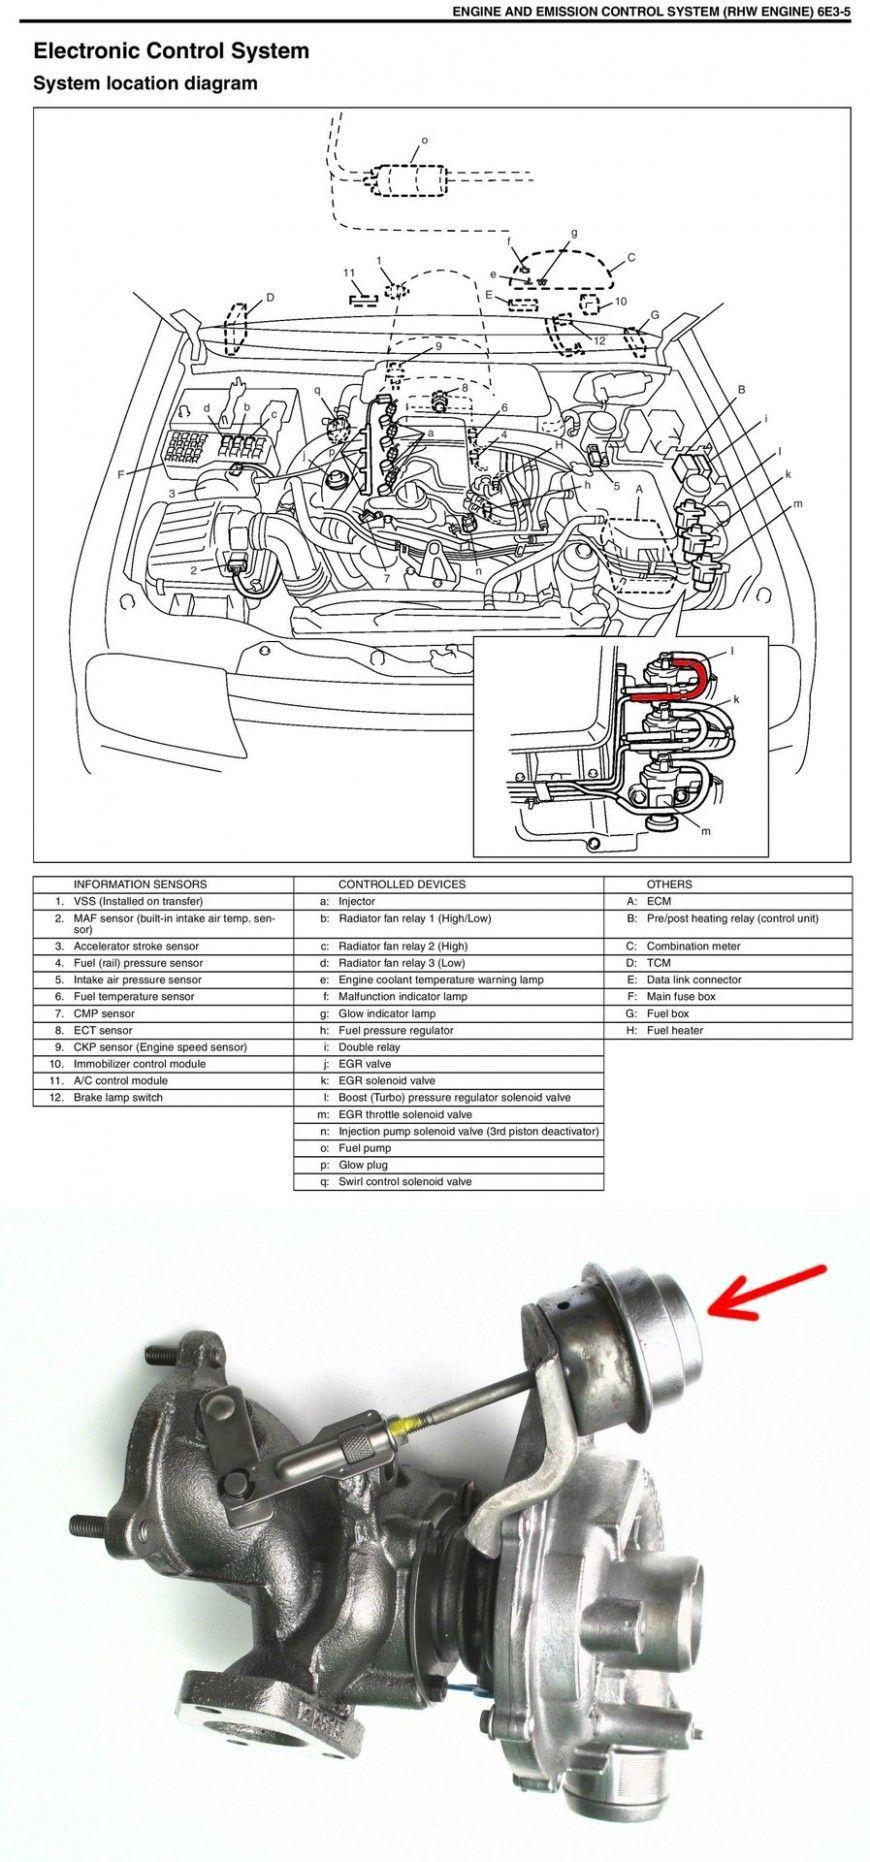 Honda Fourtrax 300 4x4 Wiring Diagram